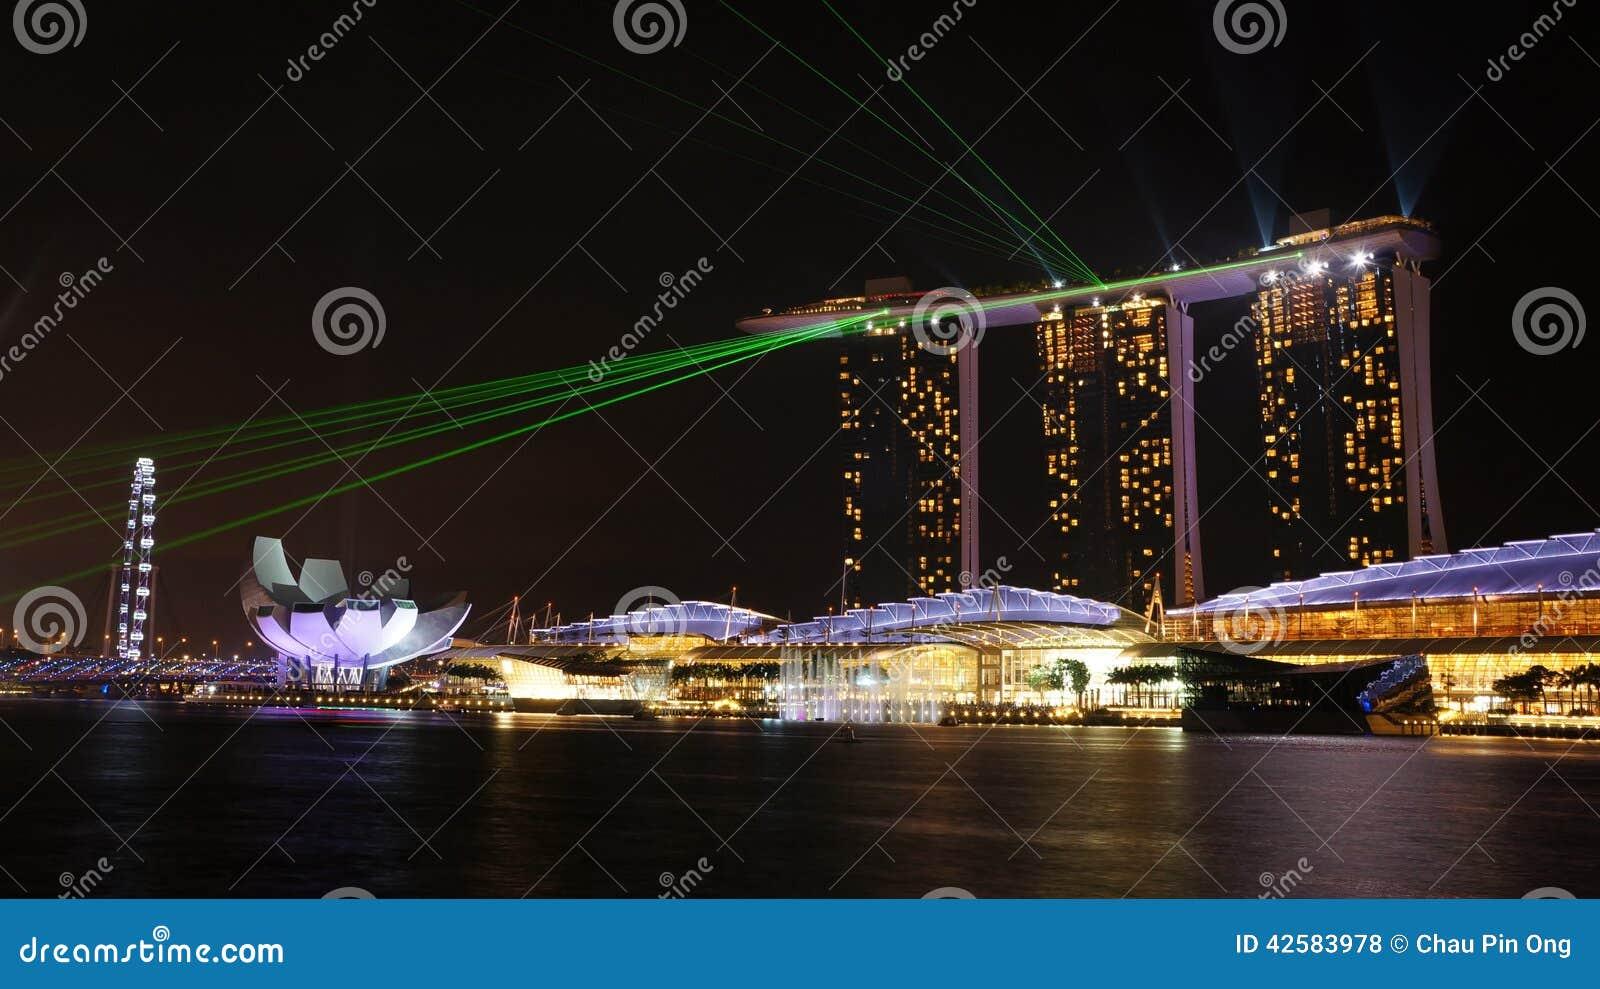 marina bay sands laser light show time wonder full at marina bay